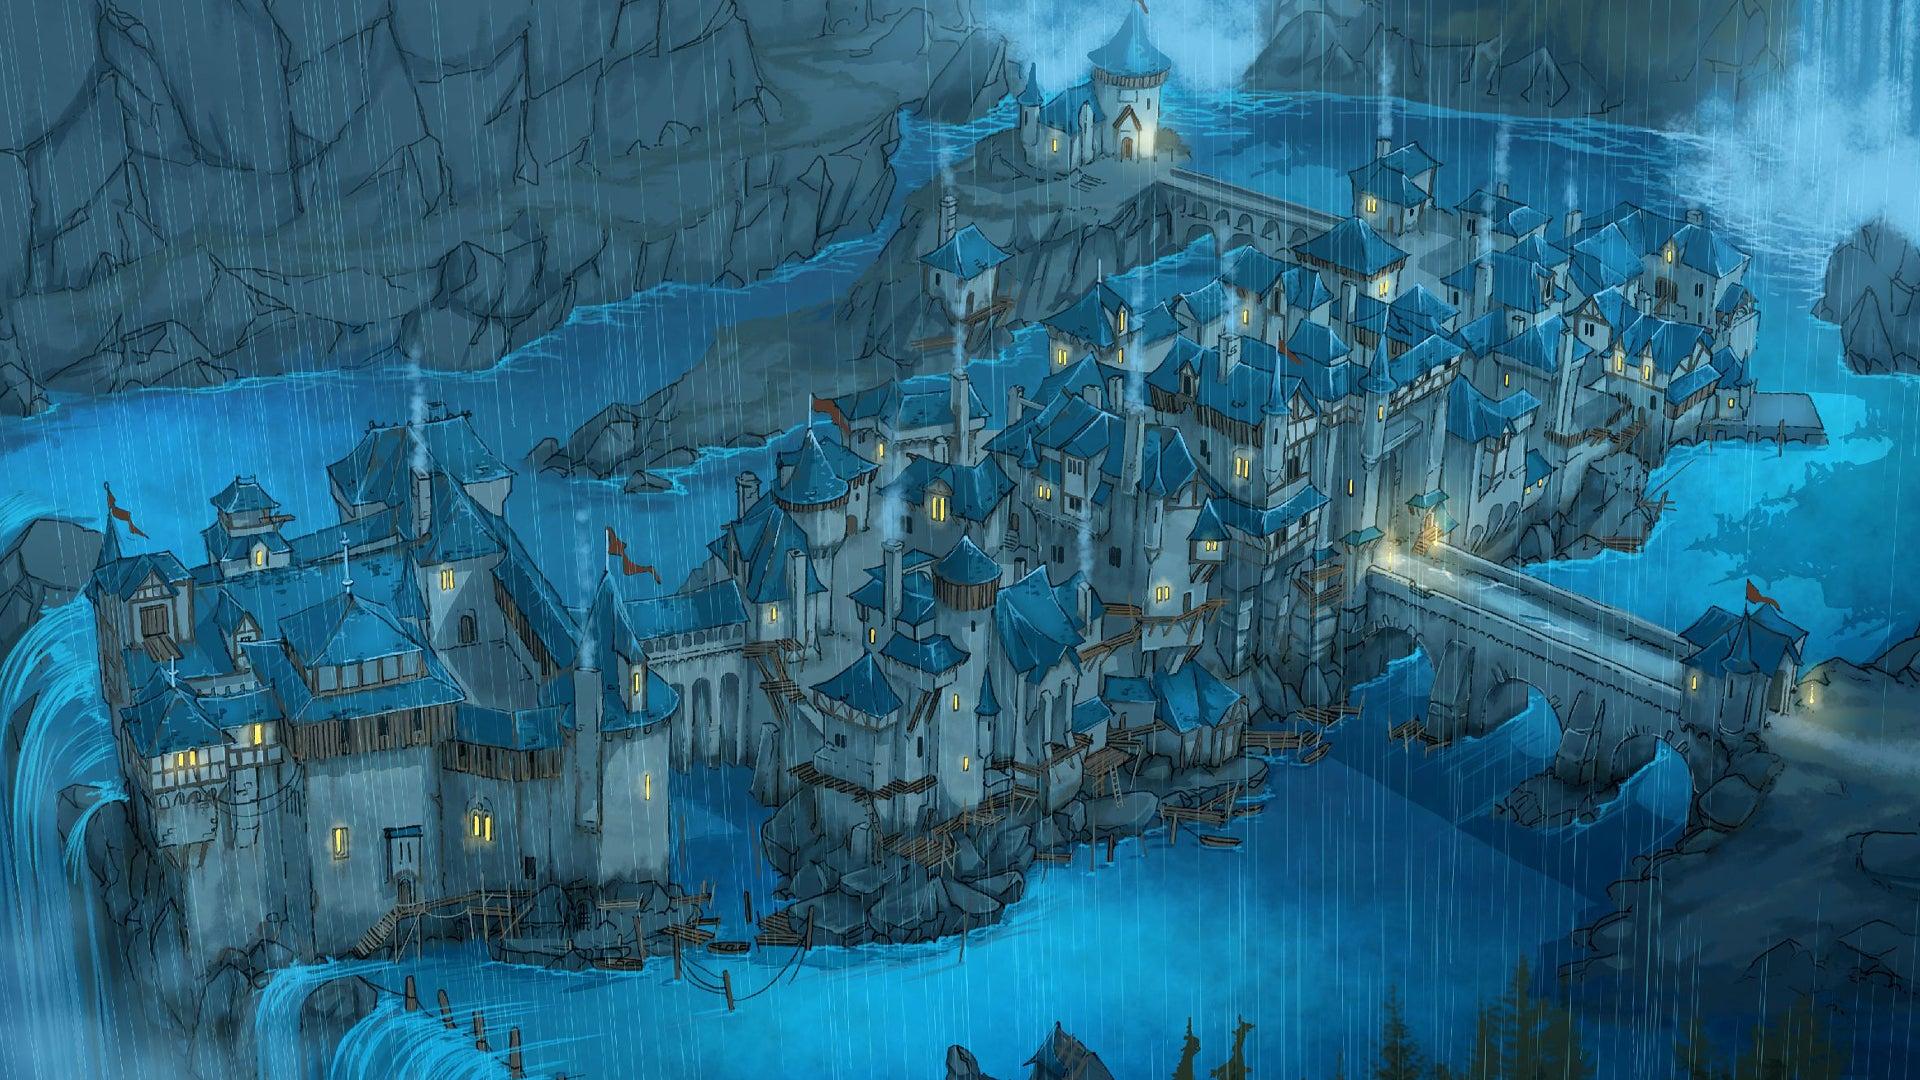 soul-raiders-board-game-artwork-town.jpg